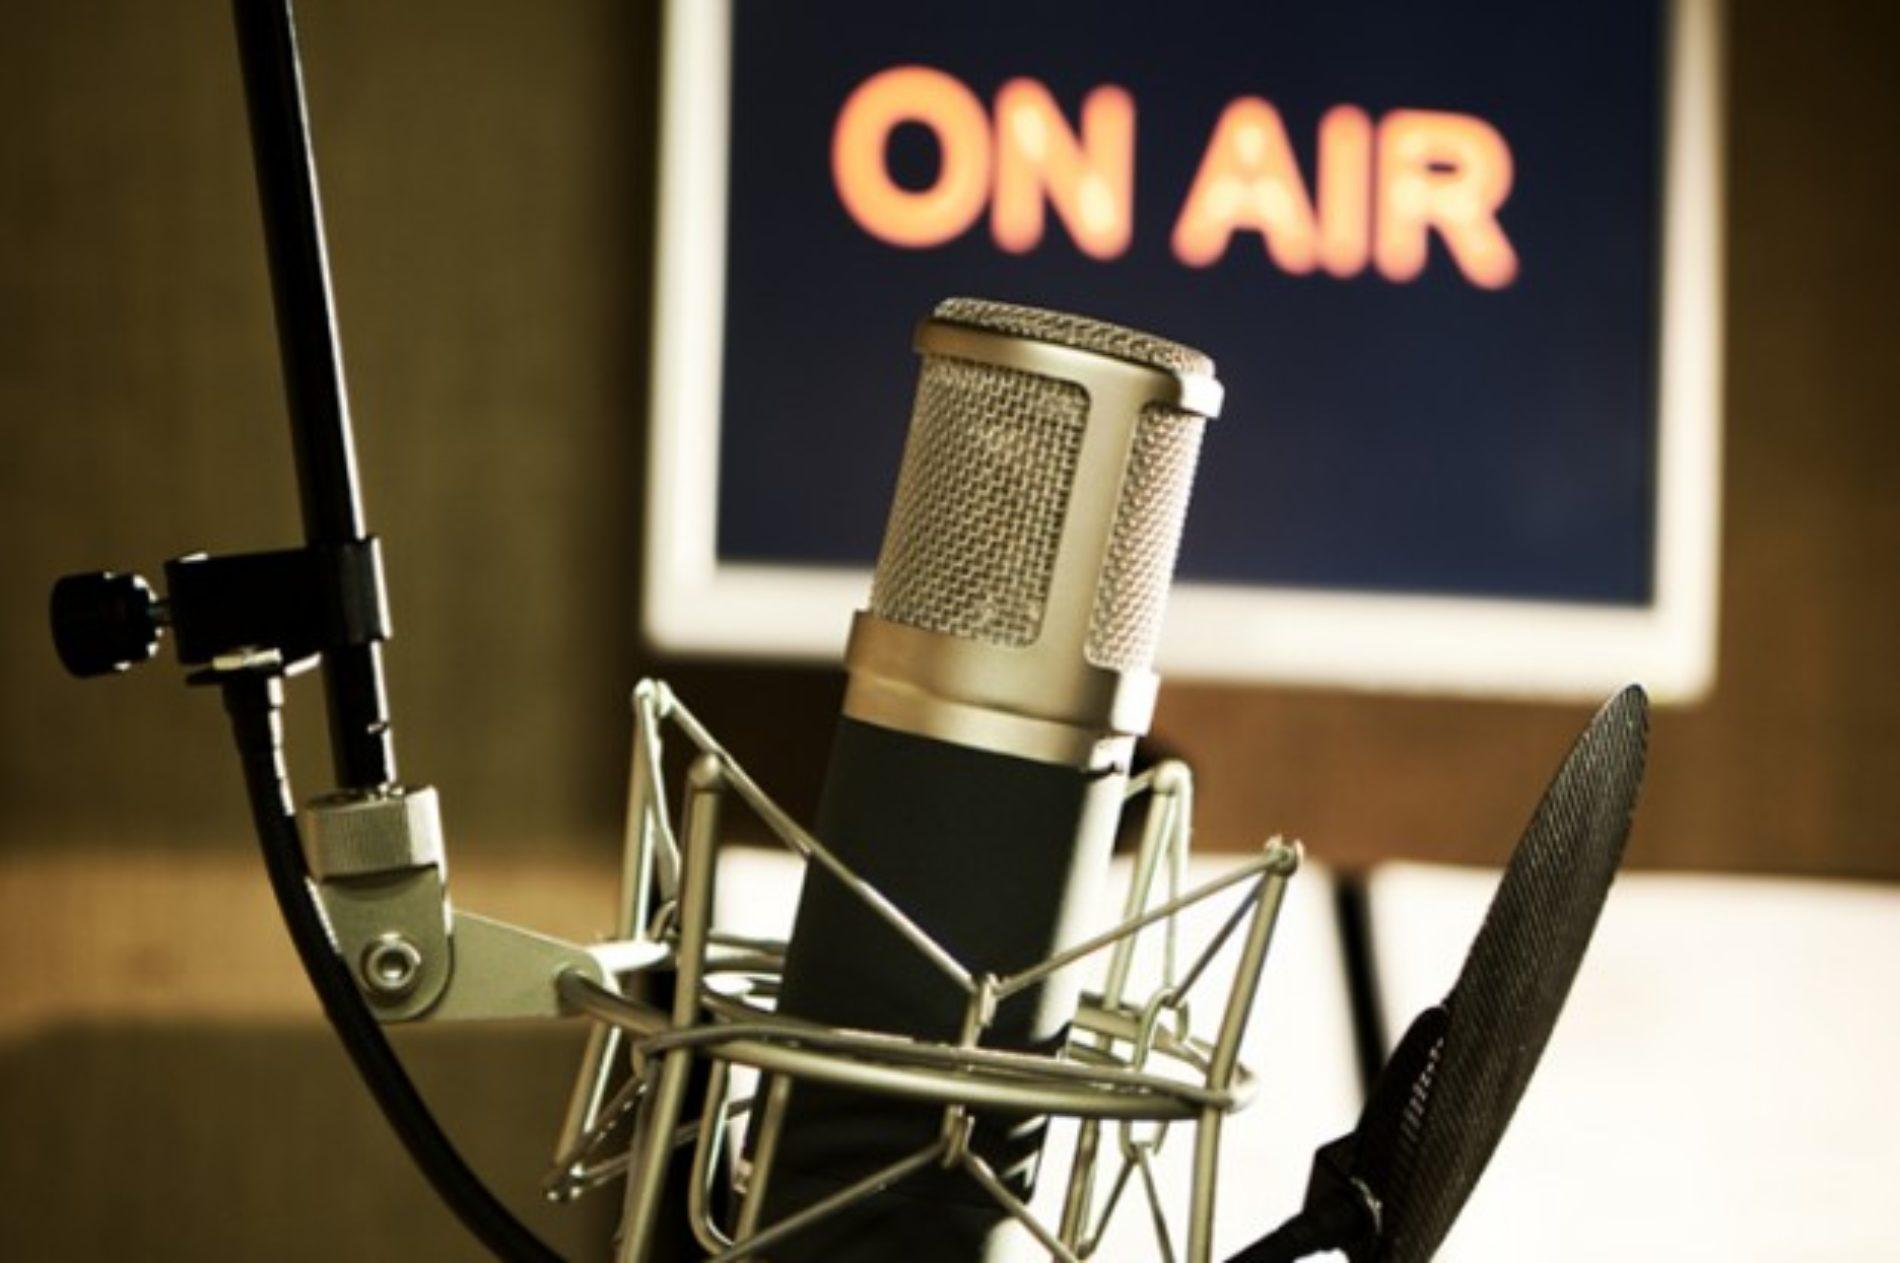 HOMOPHOBIA AND TRANSPHOBIA ON THE NIGERIAN RADIO